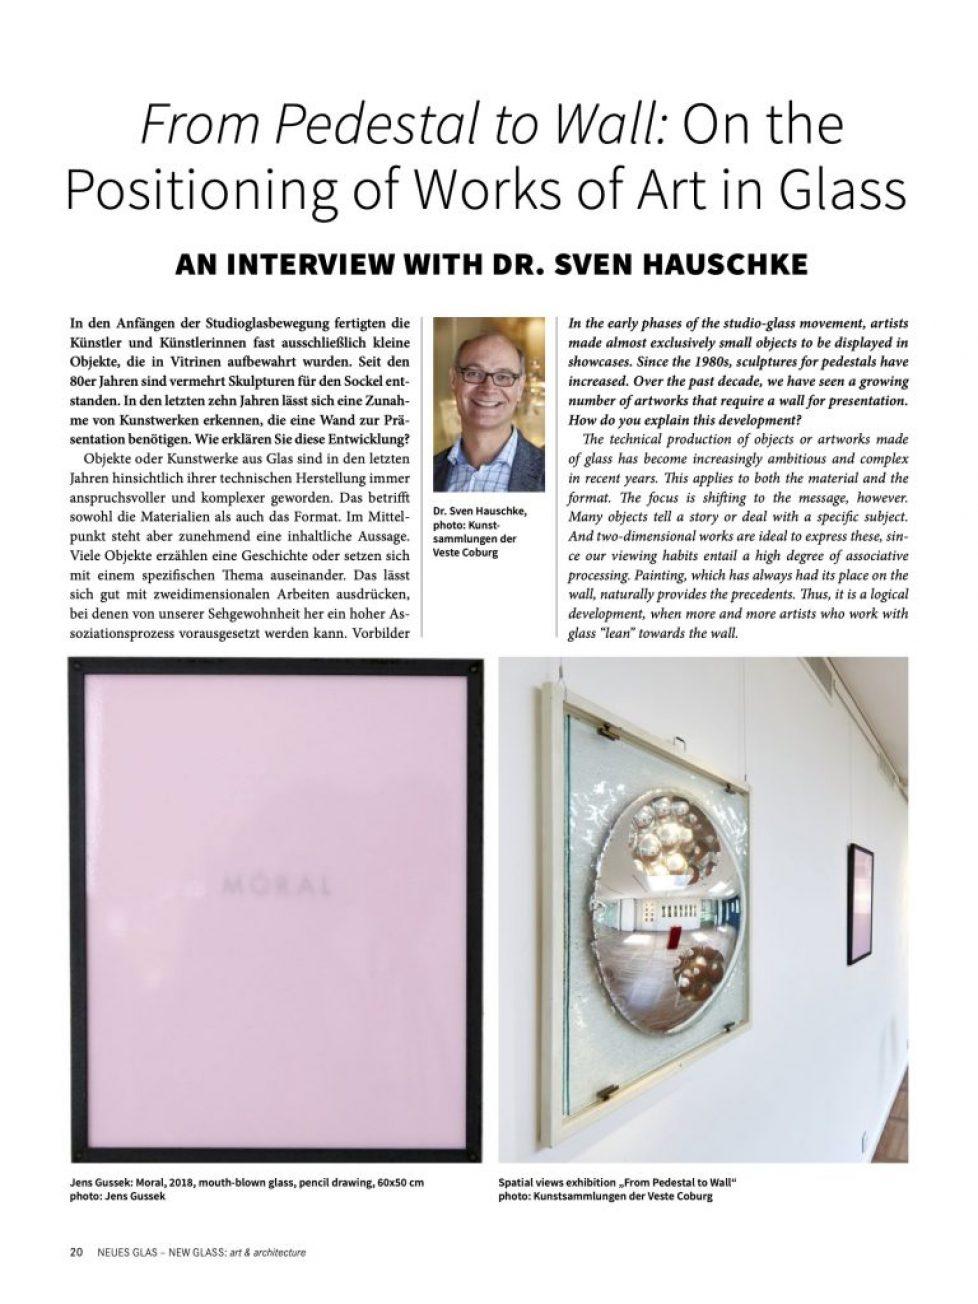 Neues Glas New Glass